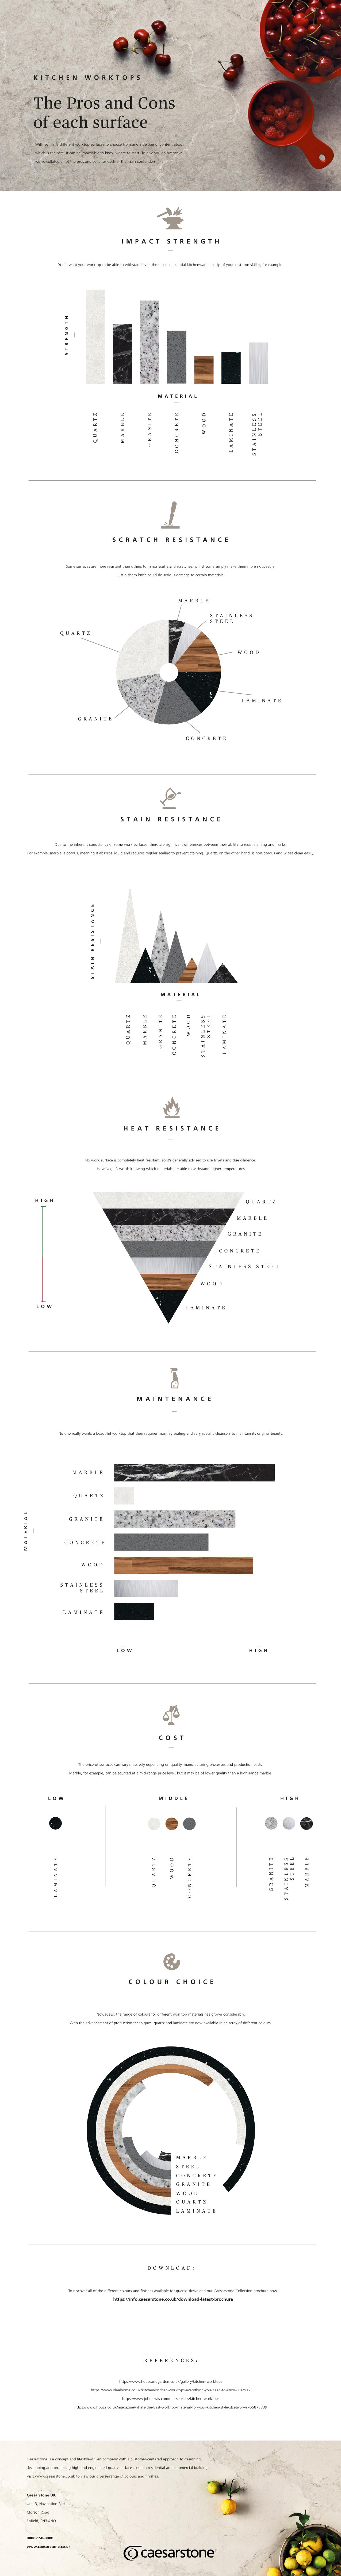 Worktop Comparison Infographic